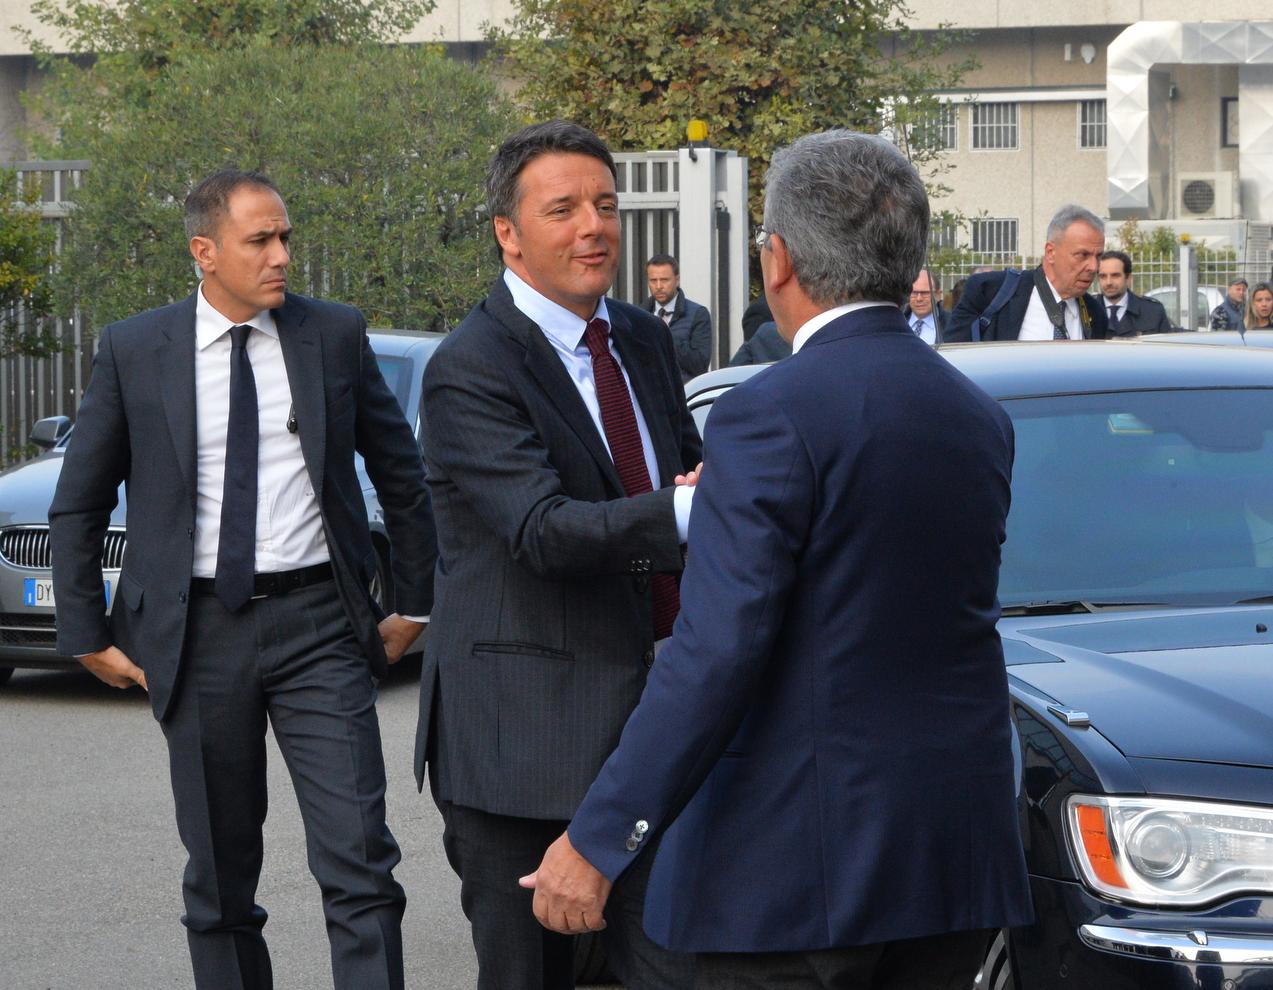 Elezioni Saronno visita Matteo Renzi